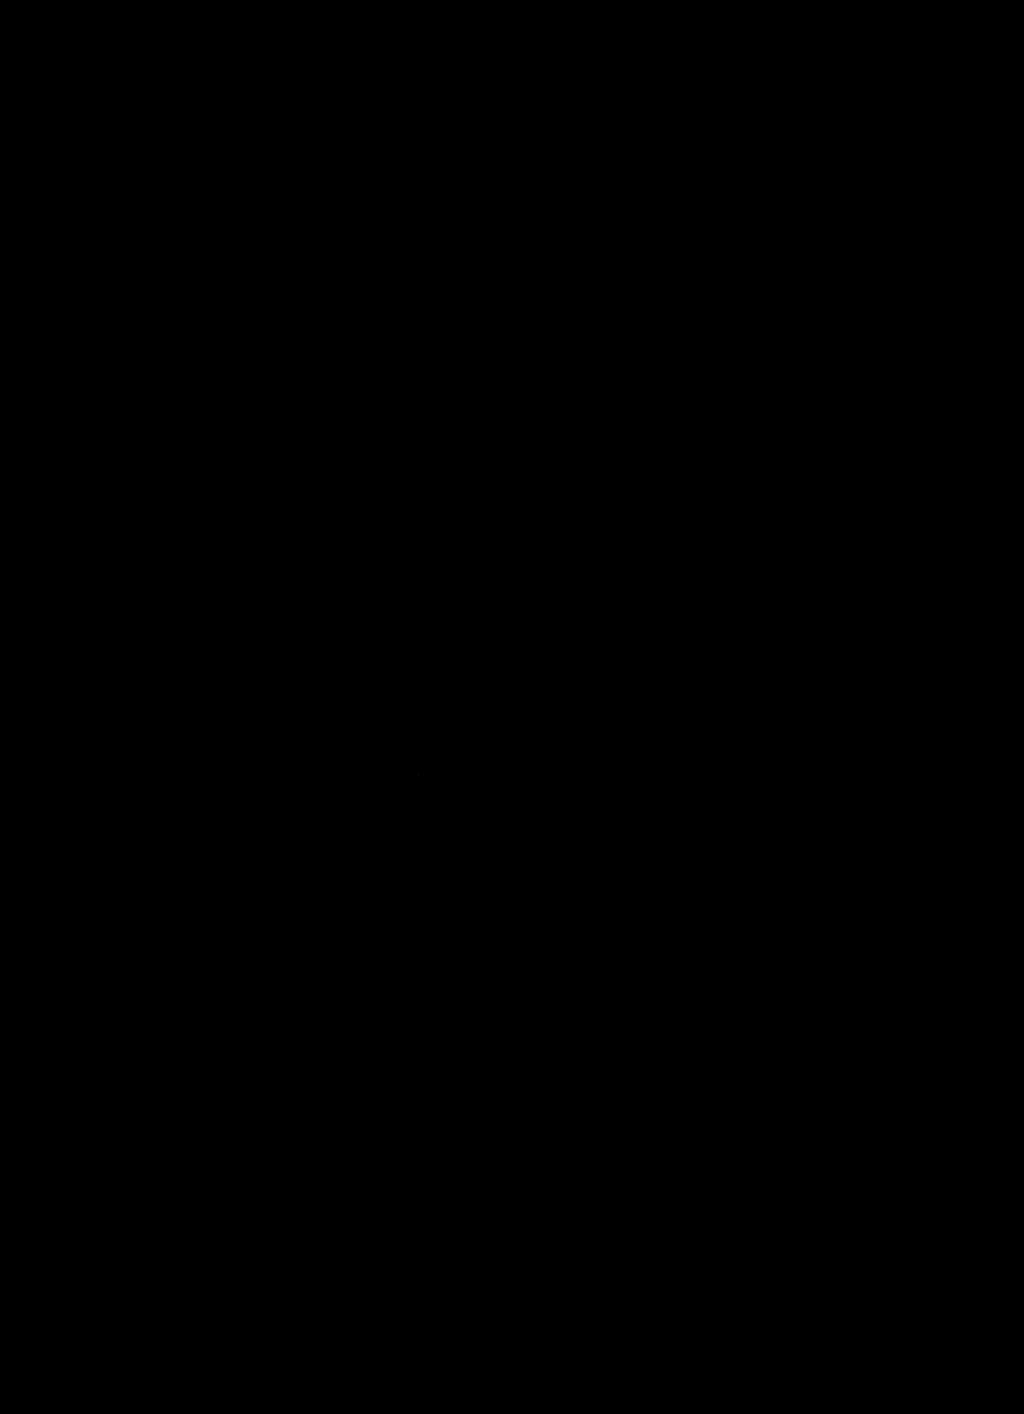 Kakashi Lineart : Chibi kakashi lineart by godslayerr on deviantart